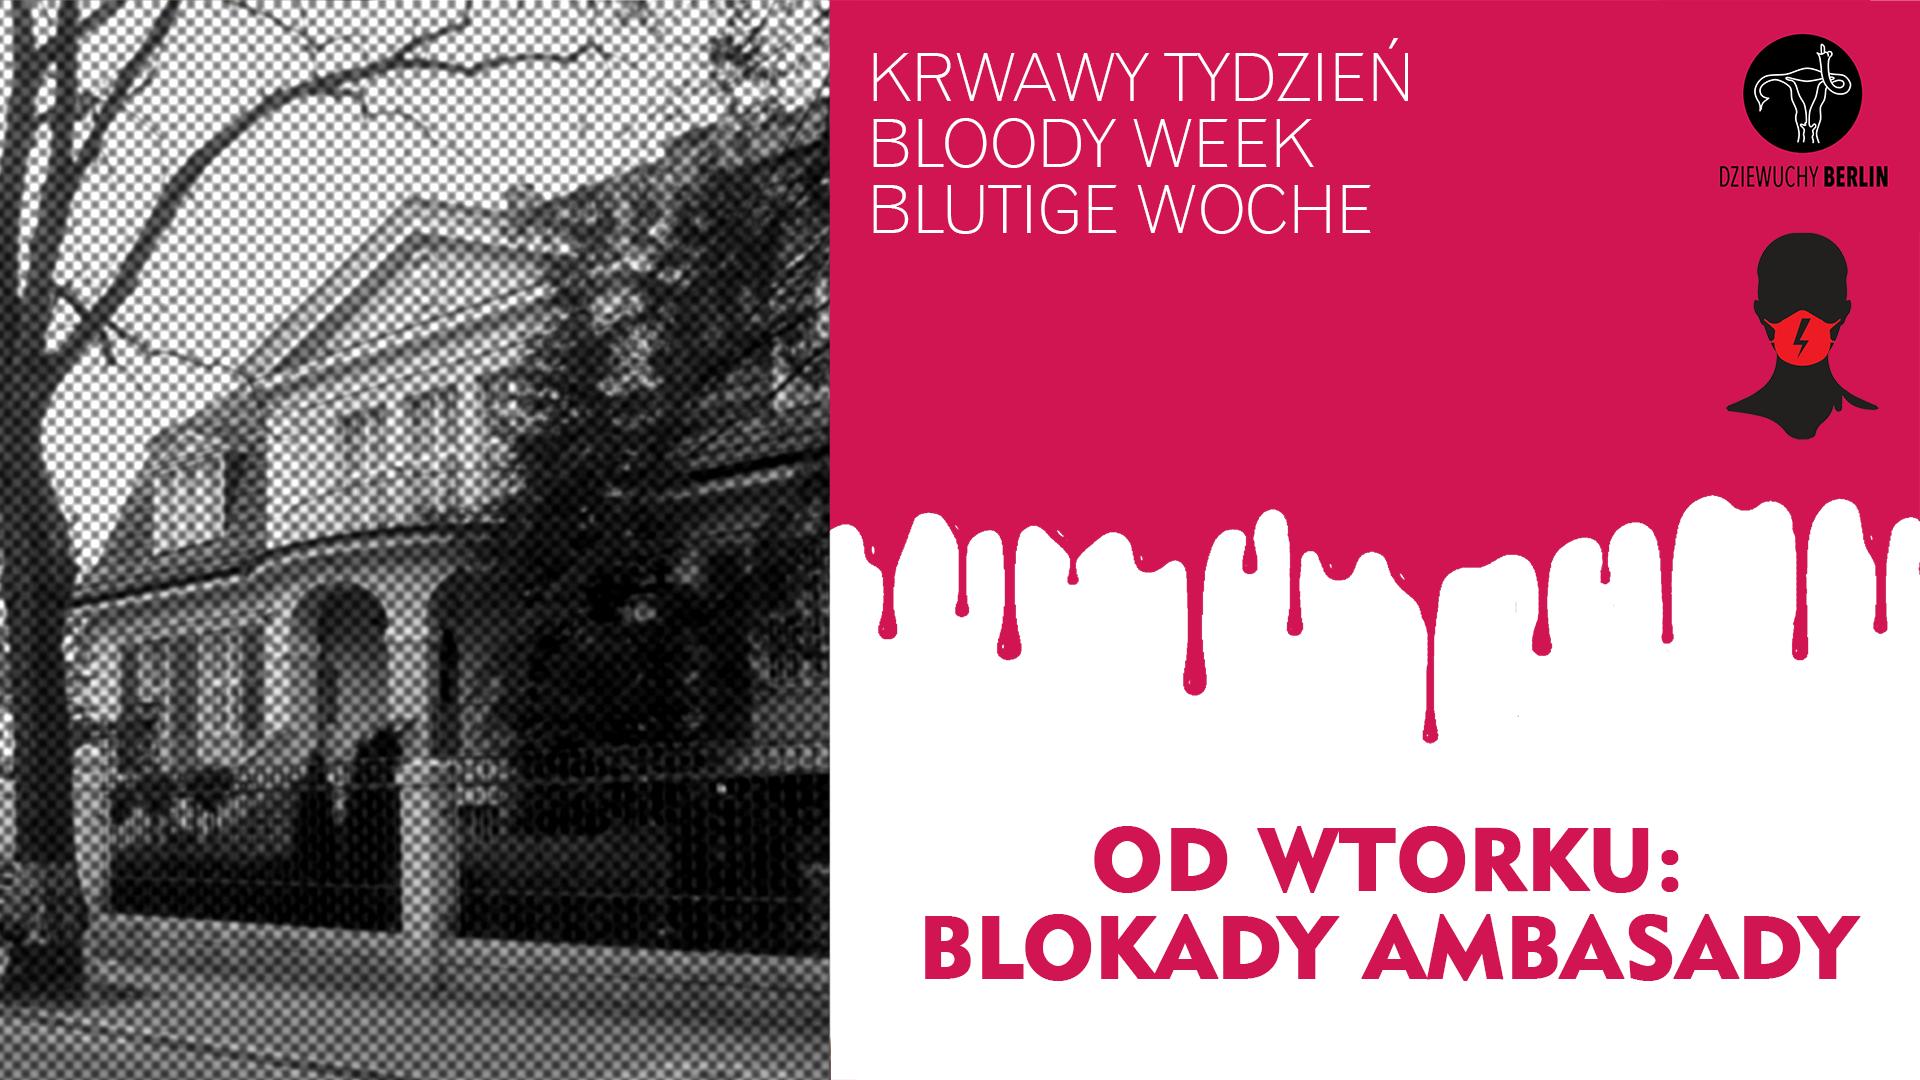 Bloody Week: Blokady Ambasady   Action